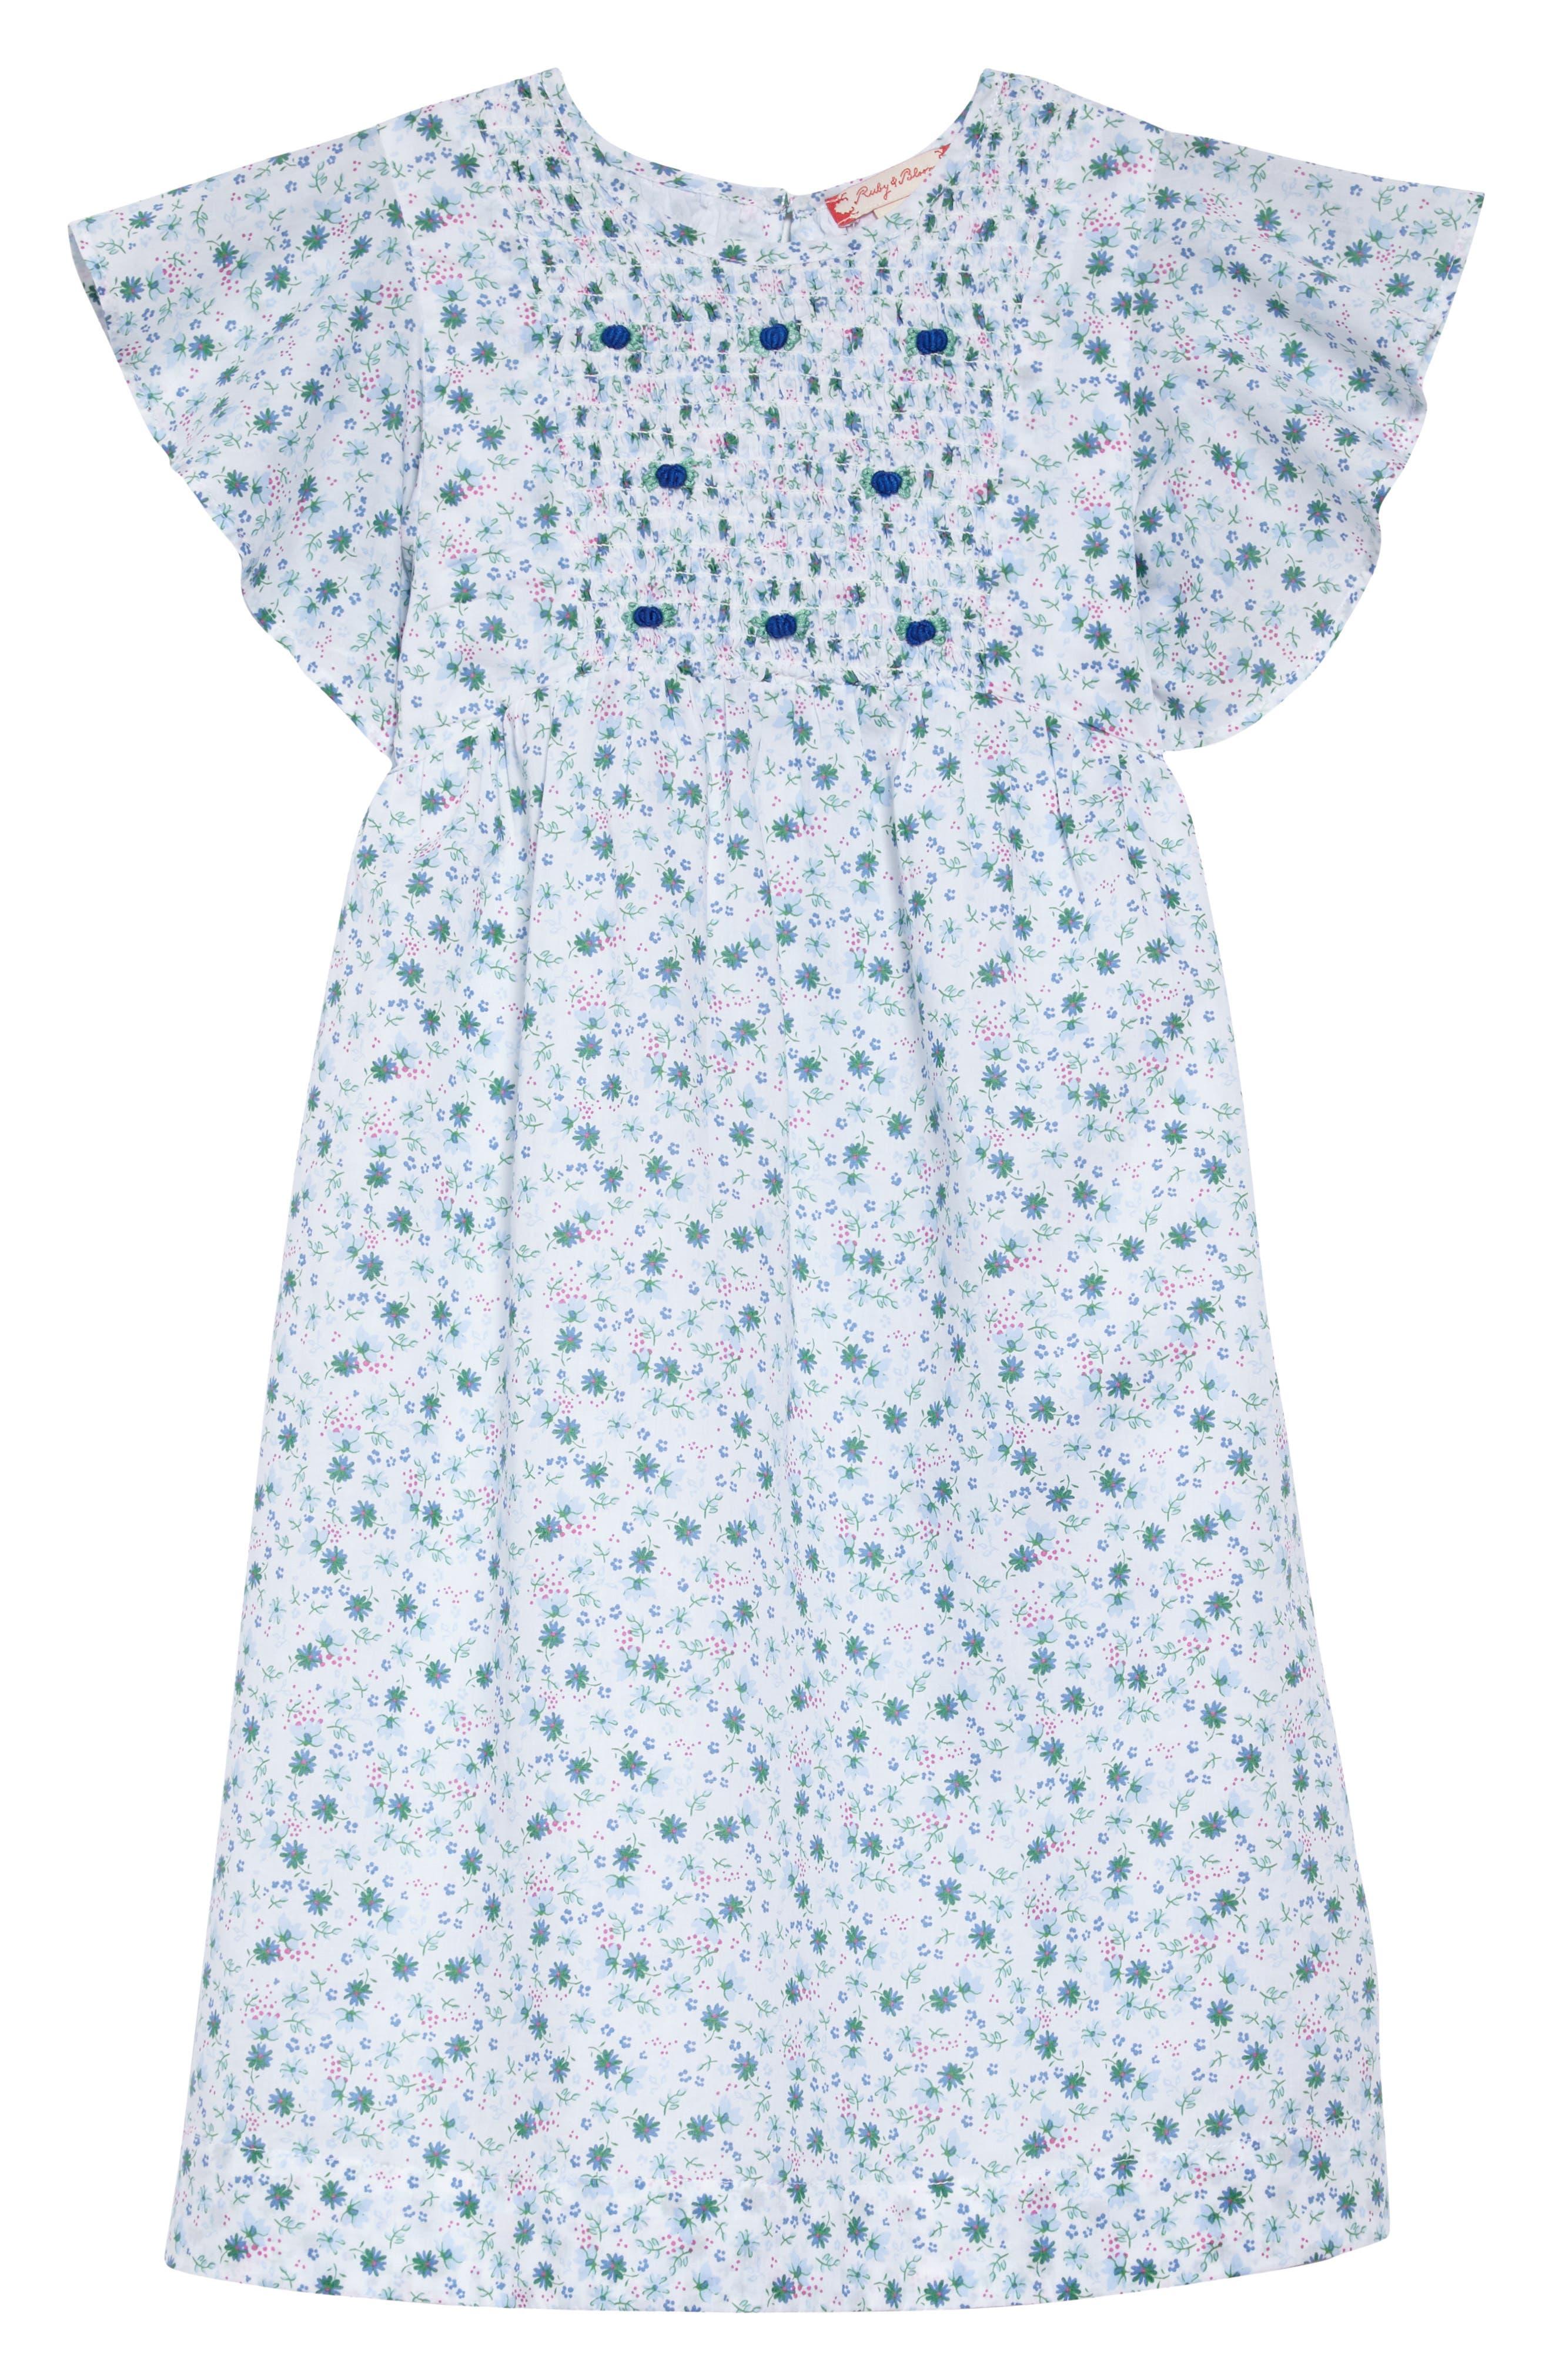 Floral Flutter Sleeve Dress,                             Main thumbnail 1, color,                             100